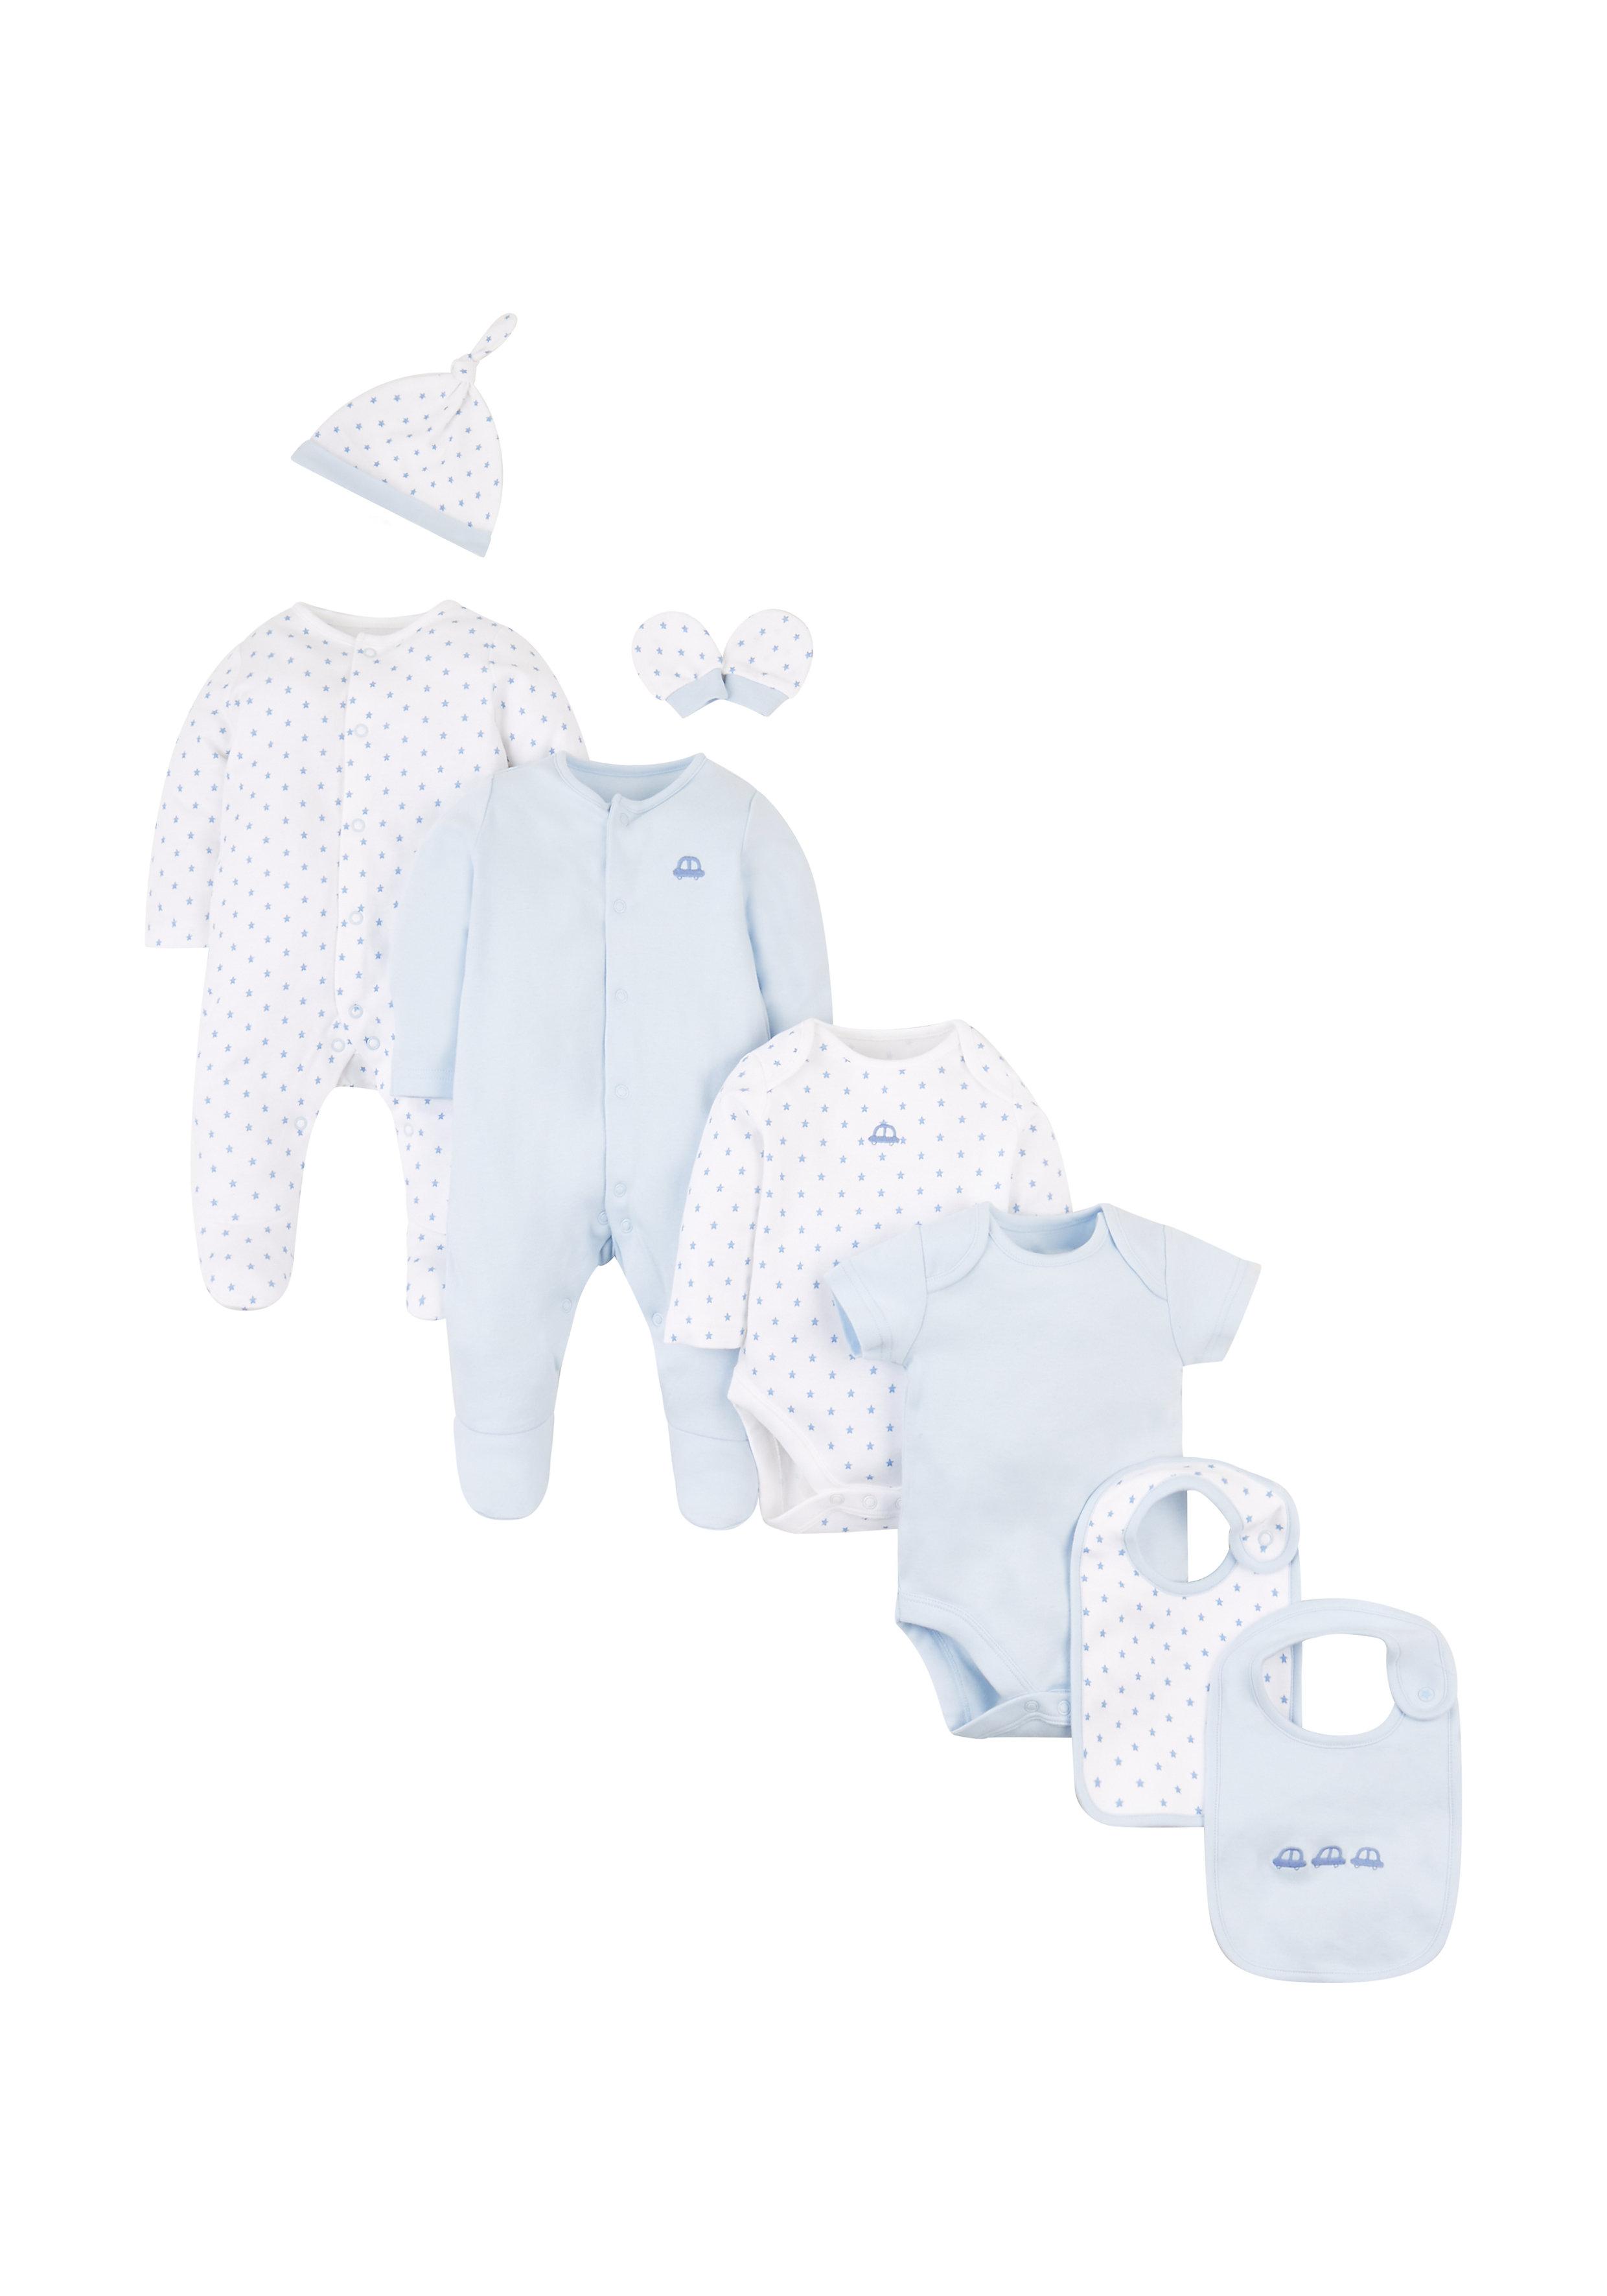 Mothercare   Boys 8 Piece Set Printed - White